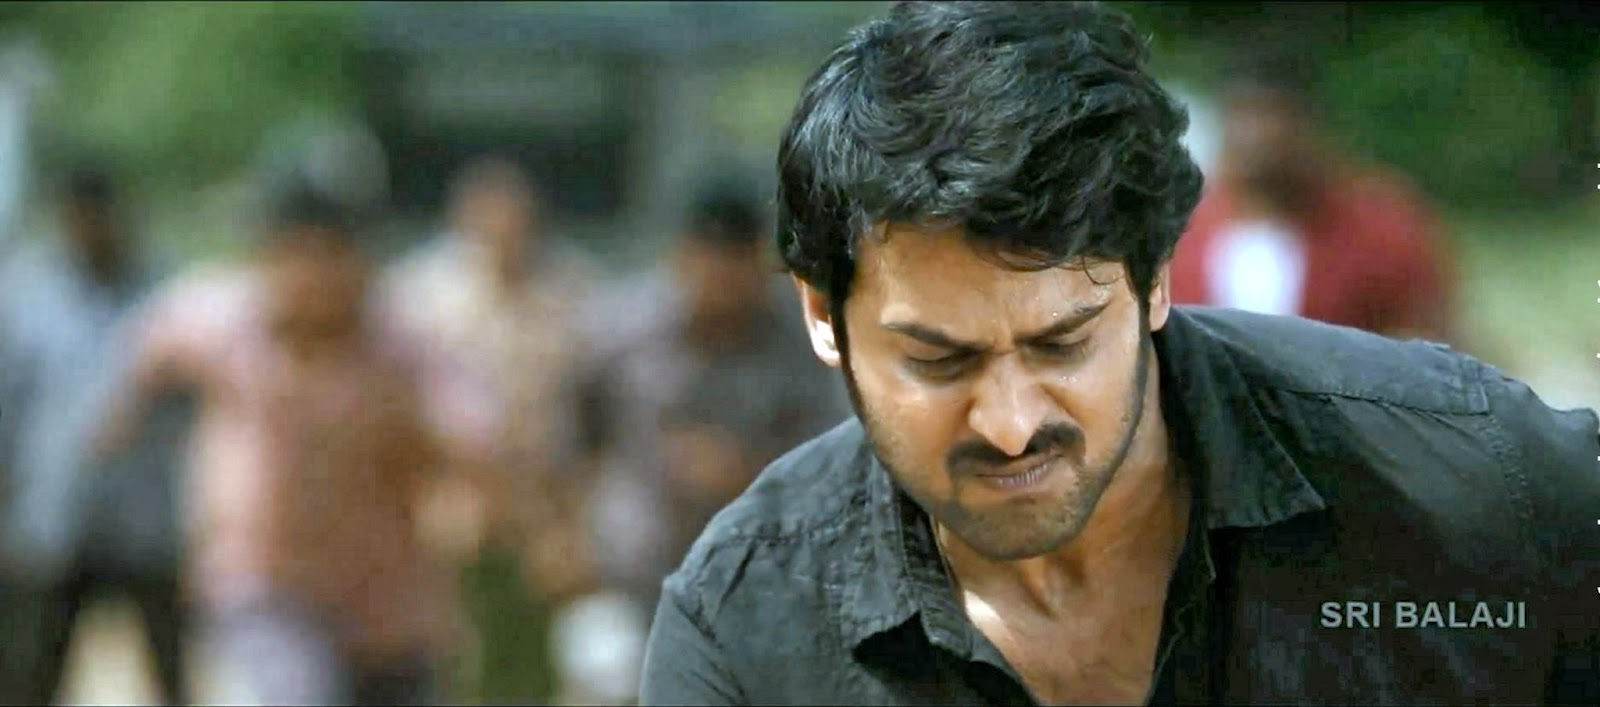 Prabhas Fans Forever: Rain Fight Snaps From Mirchi Movie